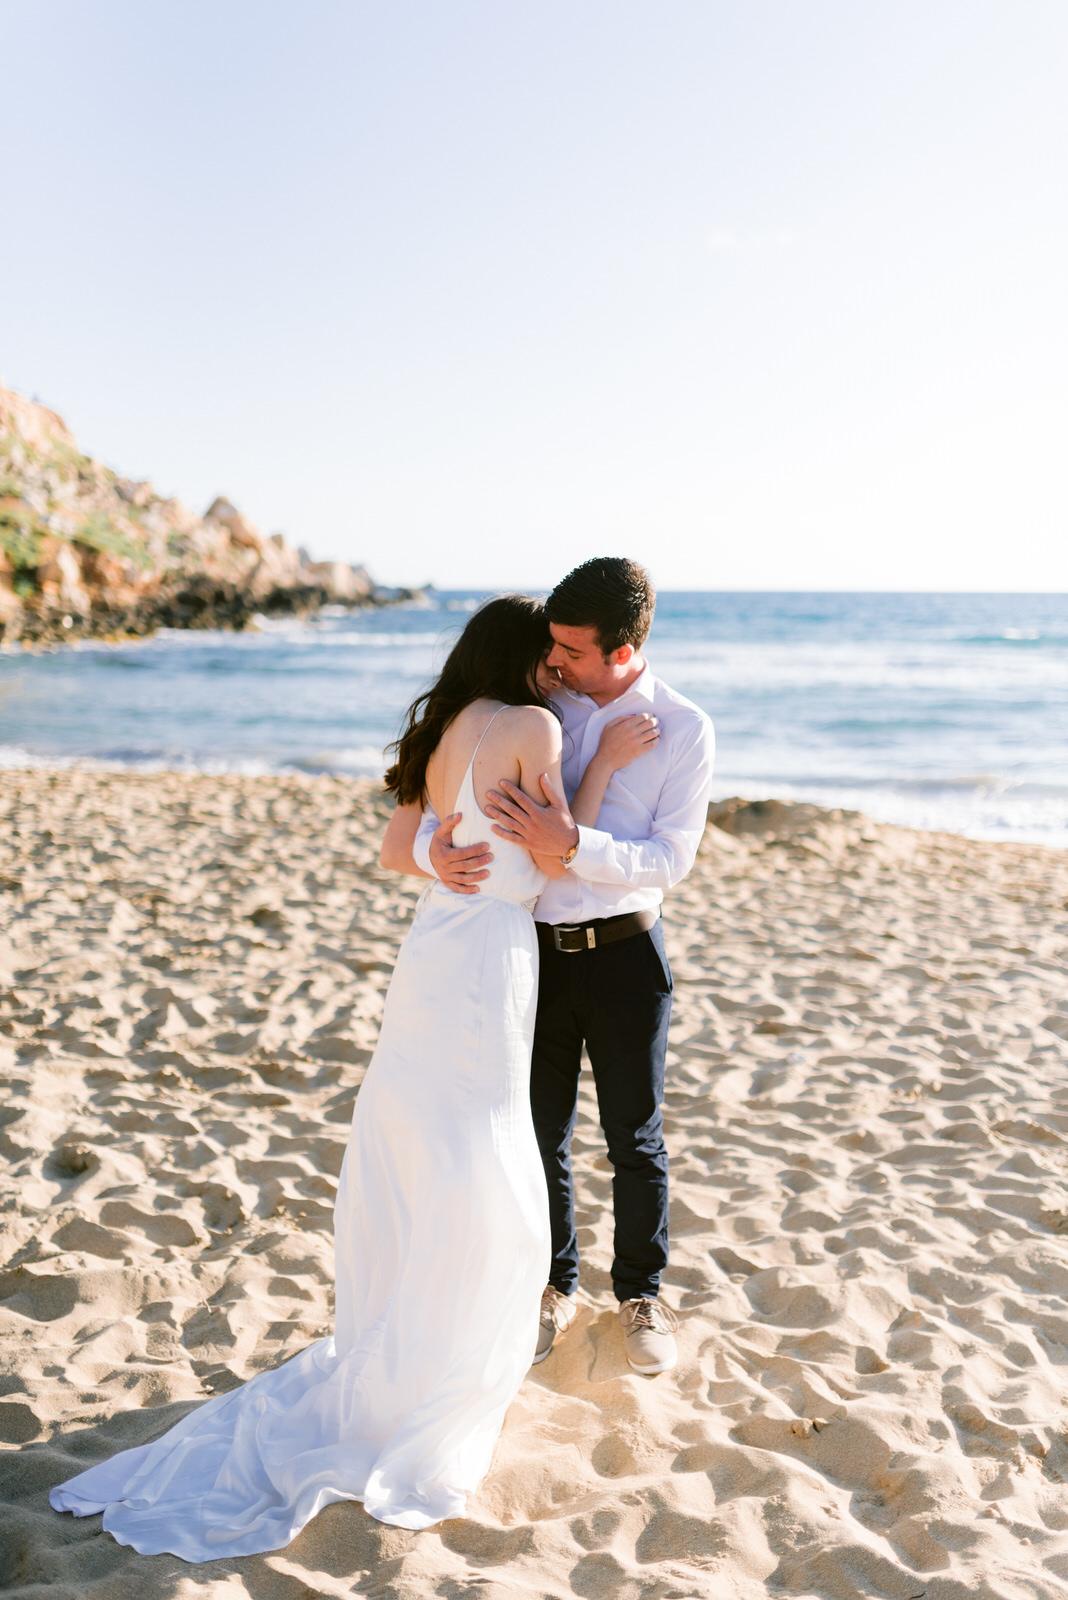 mdina wedding, malta wedding photography, malta elopement, golden bay malta wedding photos, wedding photographer malta, malta wedding venue, villa bologna wedding (90).jpg